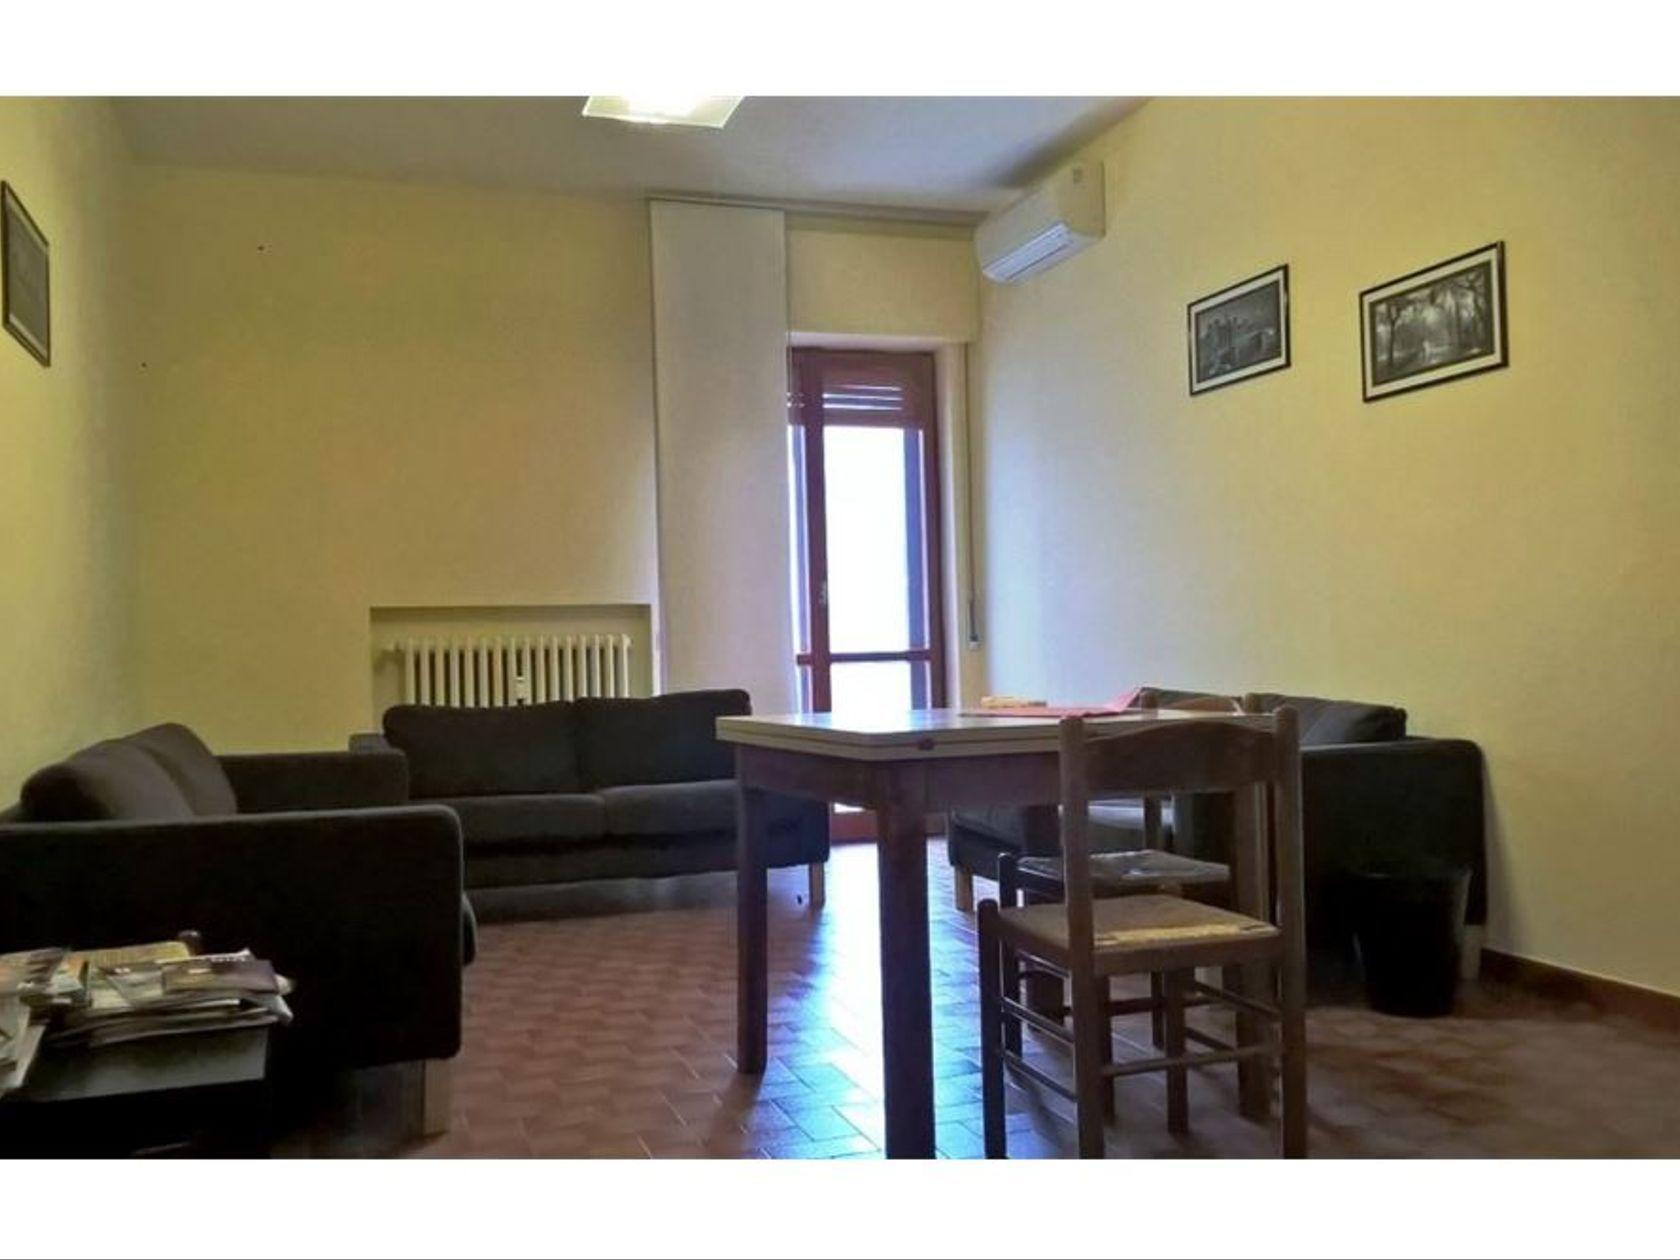 Appartamento Poggiofranco, Bari, BA Vendita